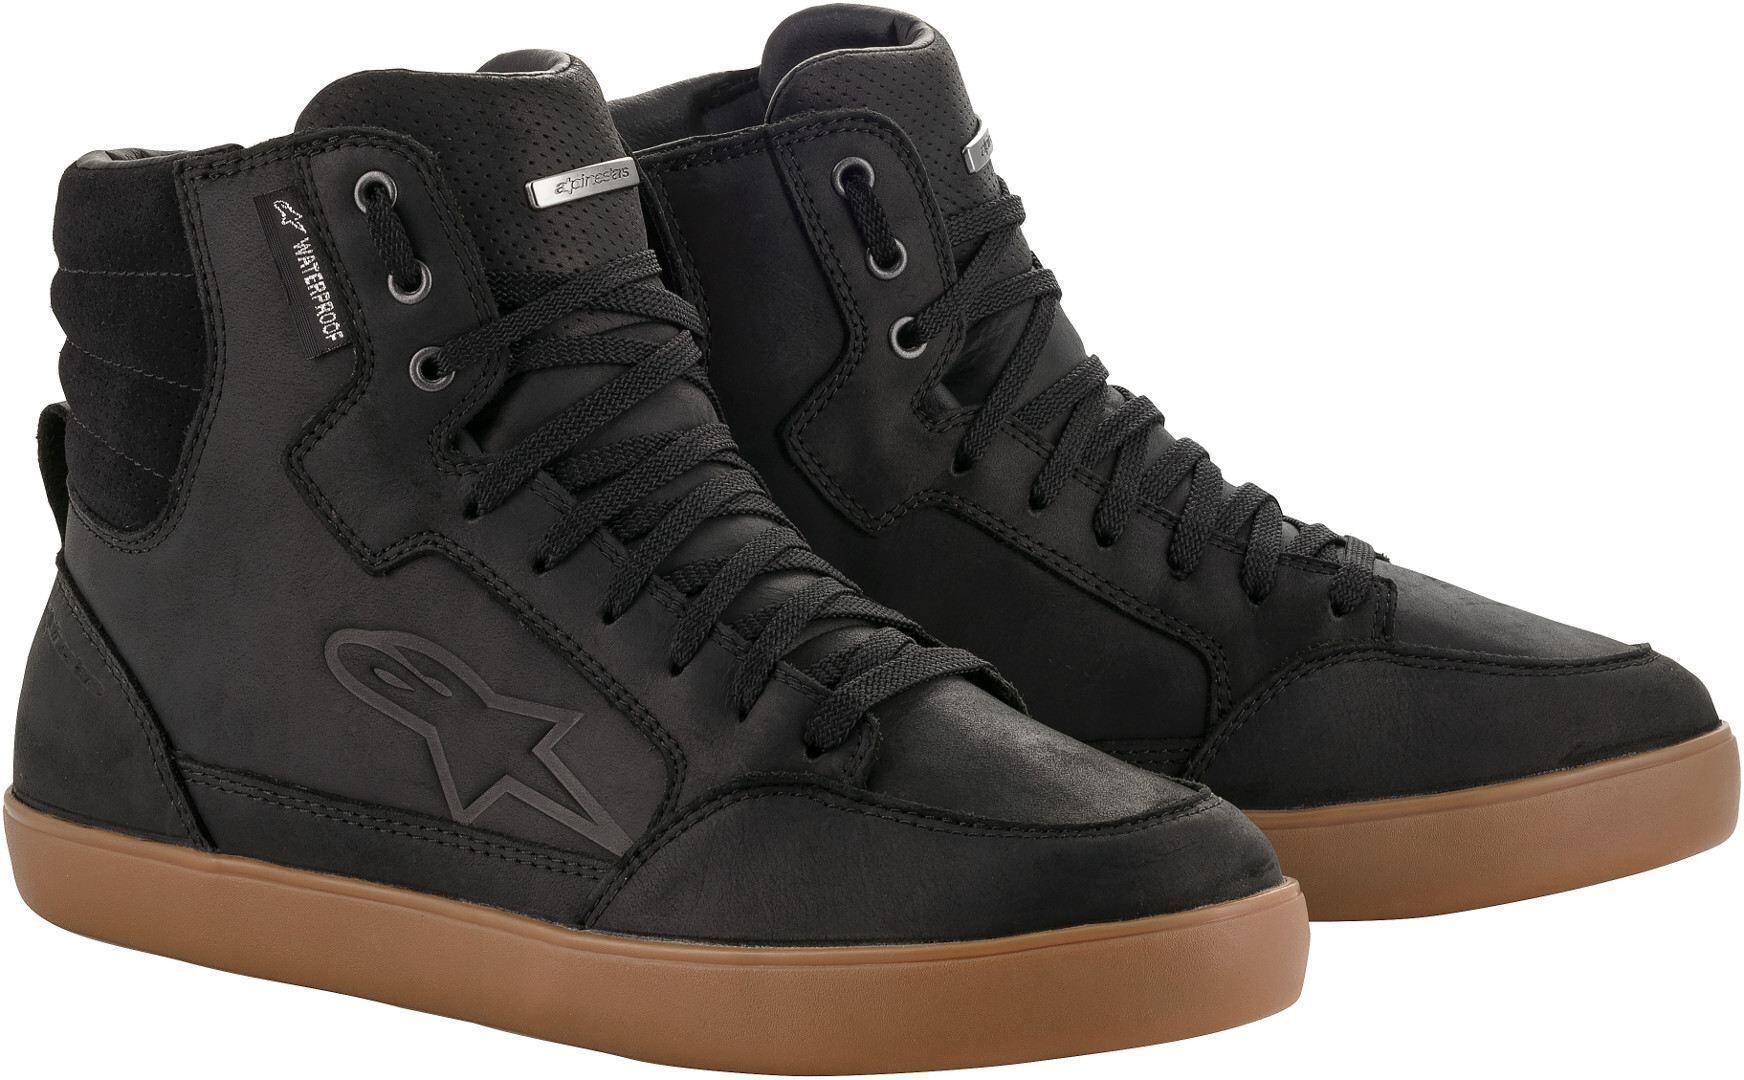 Alpinestars J-6 Chaussures imperméables Noir Brun taille : 47